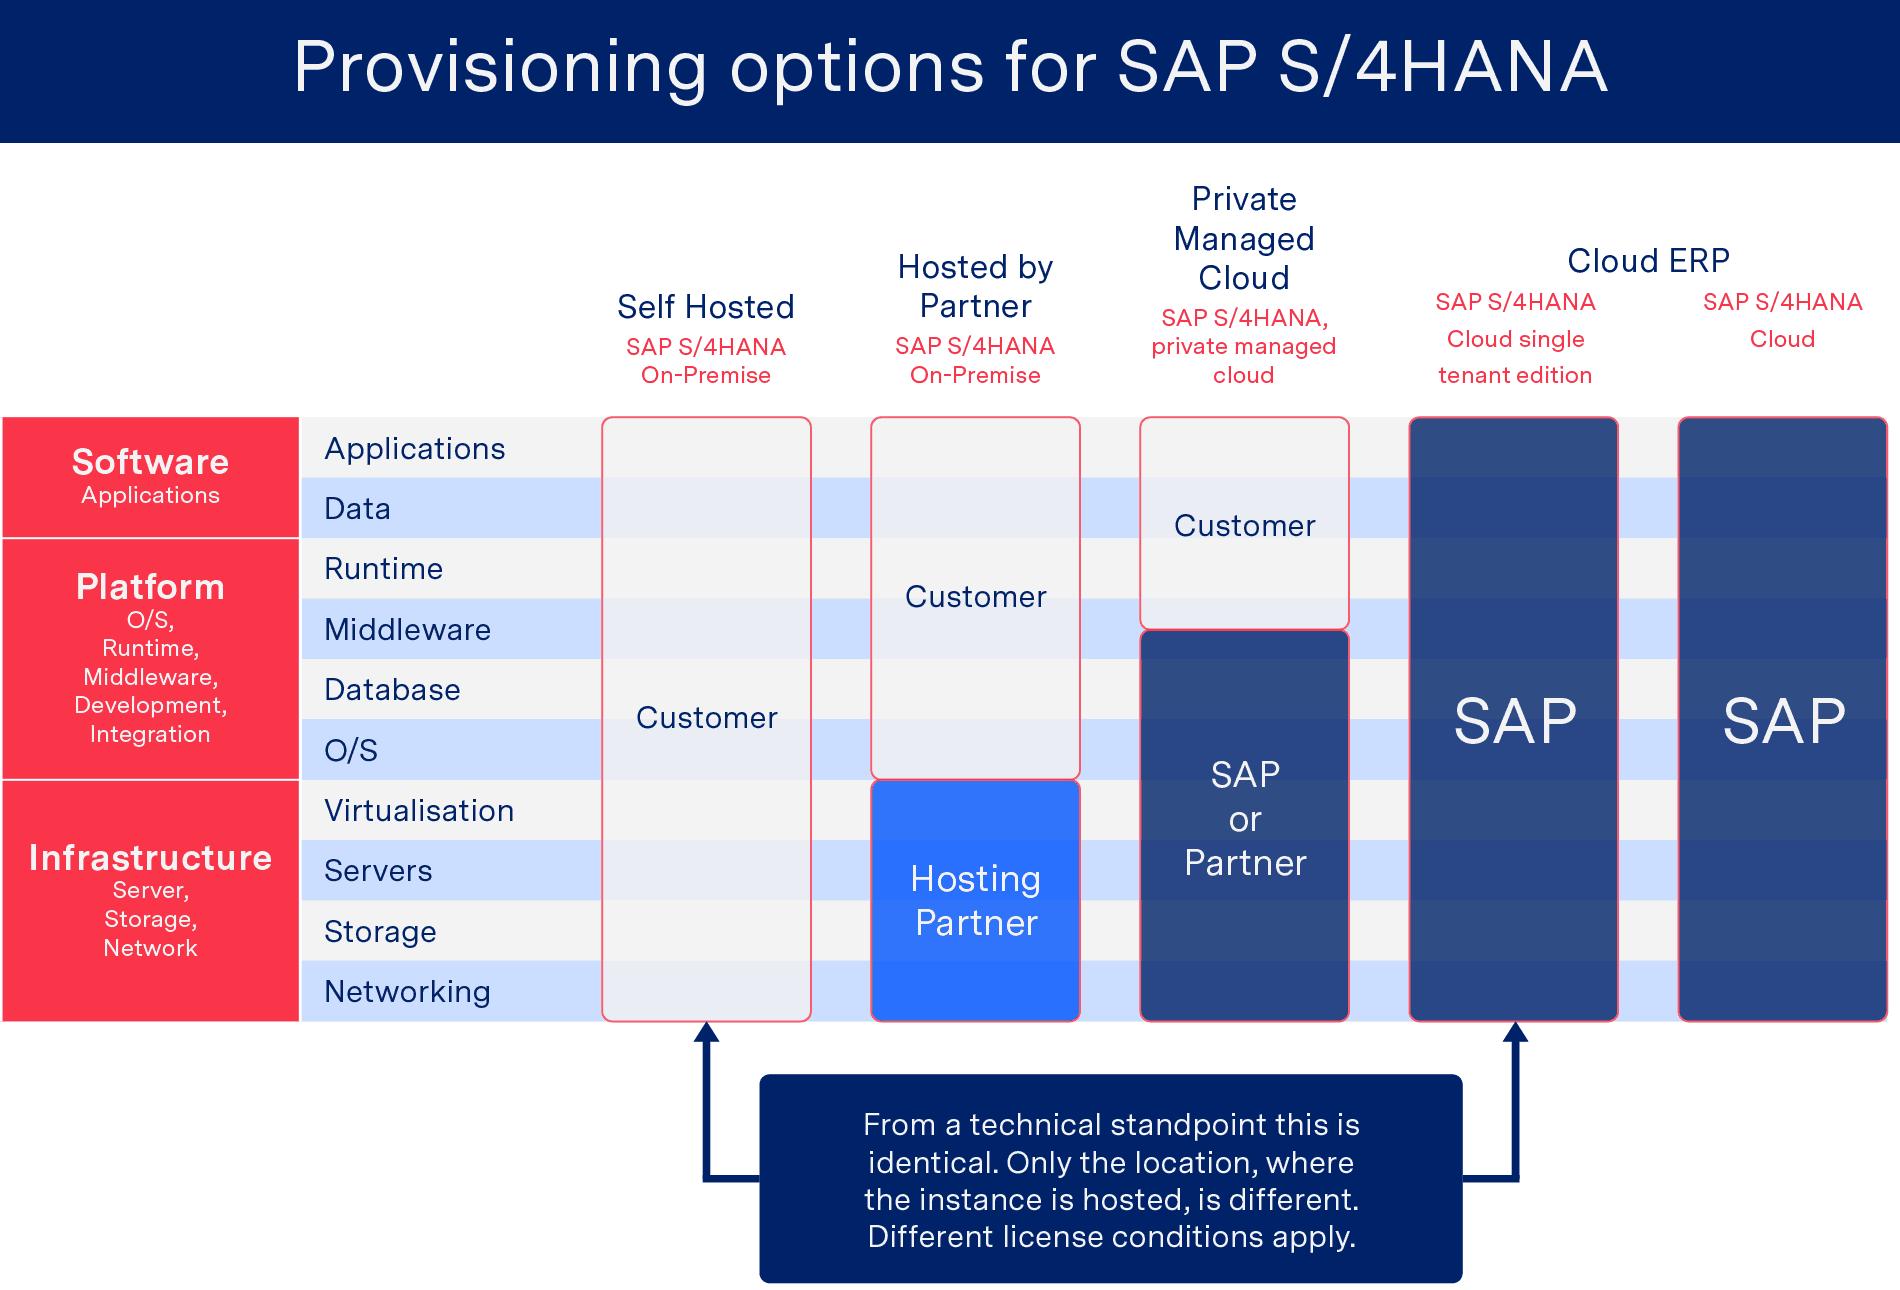 Migration to SAP S/4HANA - SAP Provisioning Platforms